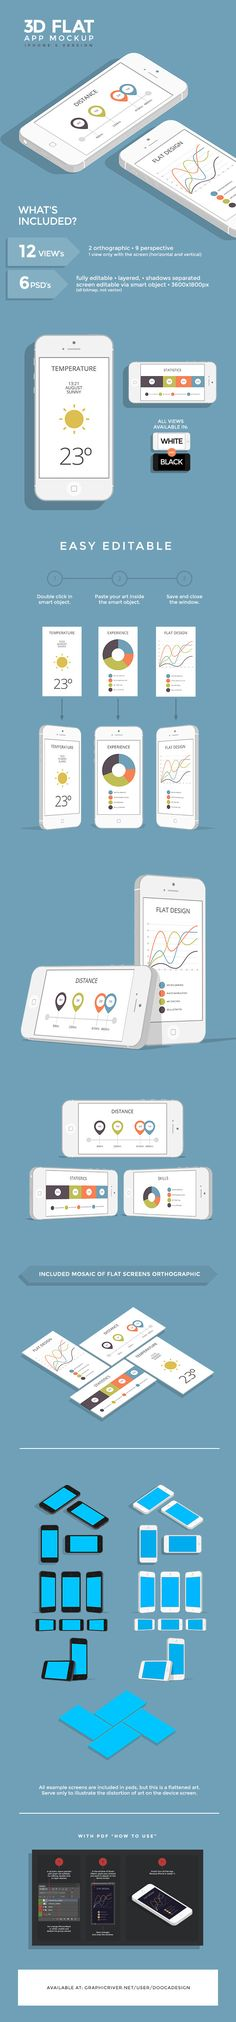 3D Flat App Mockup - iPhone by Dooca Premium Resources , via Behance